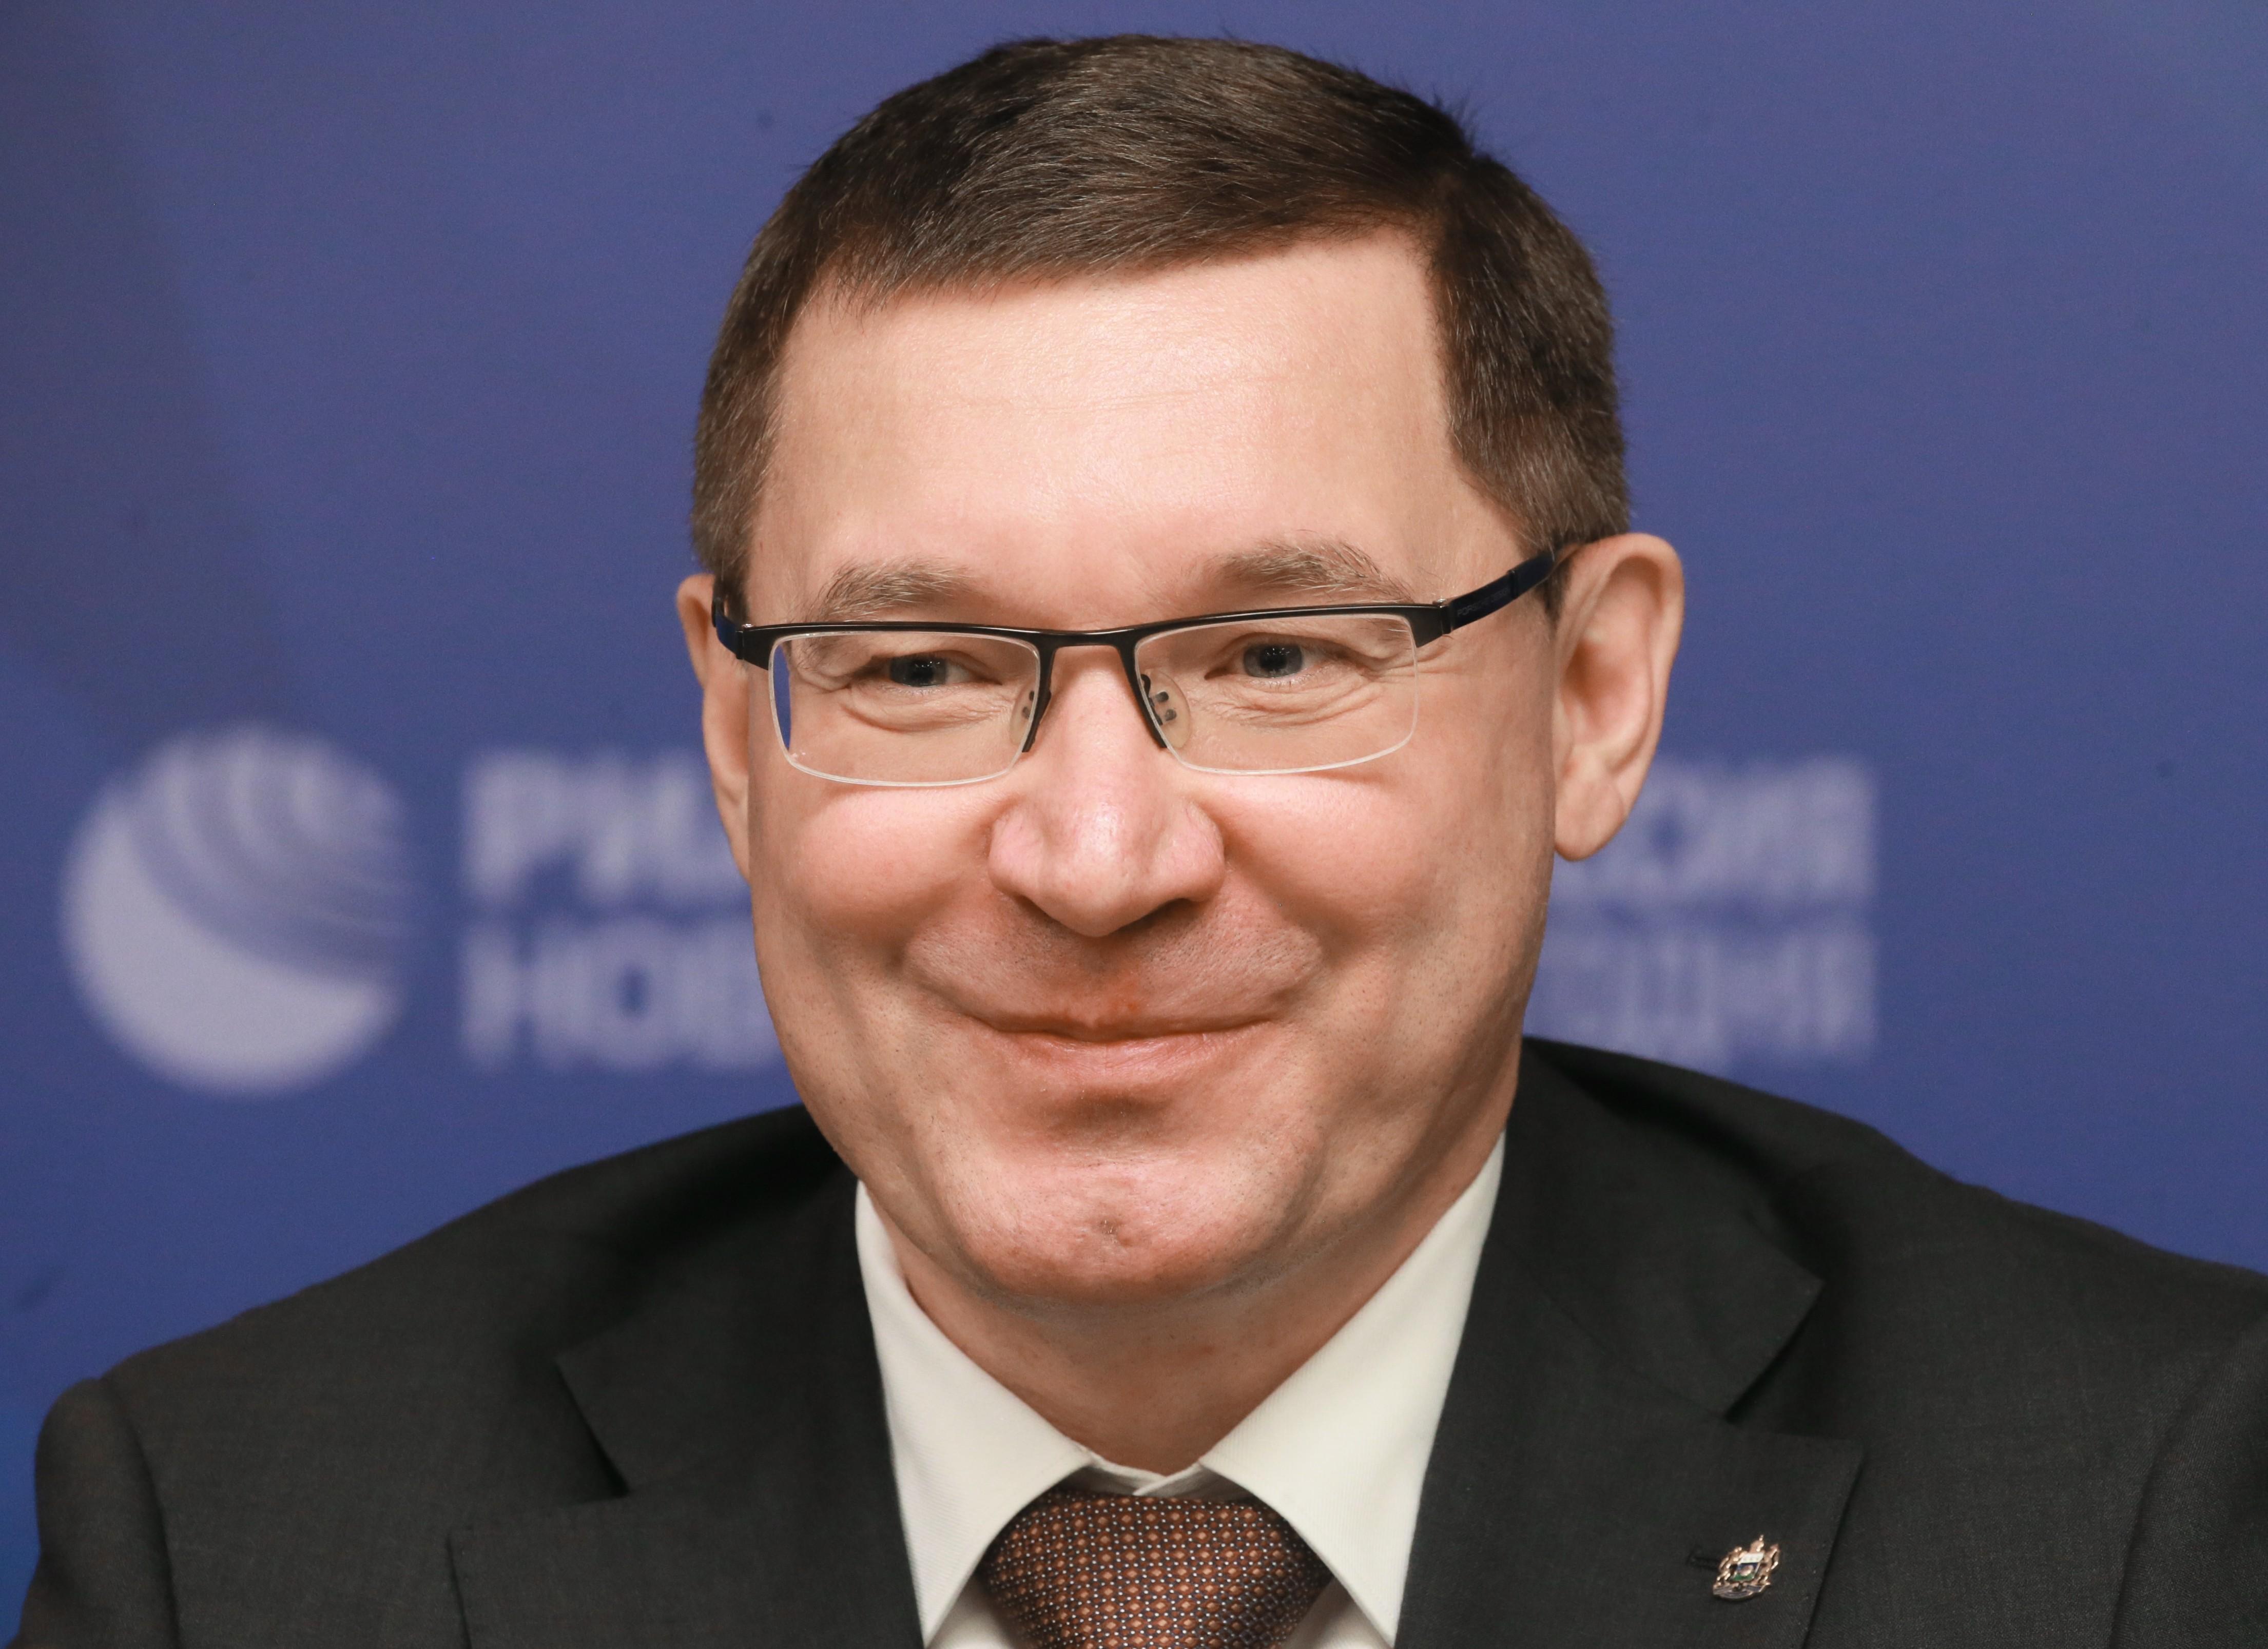 <p>Владимир Якушев. Фото: &copy; РИА Новости / Александр Натрускин</p>